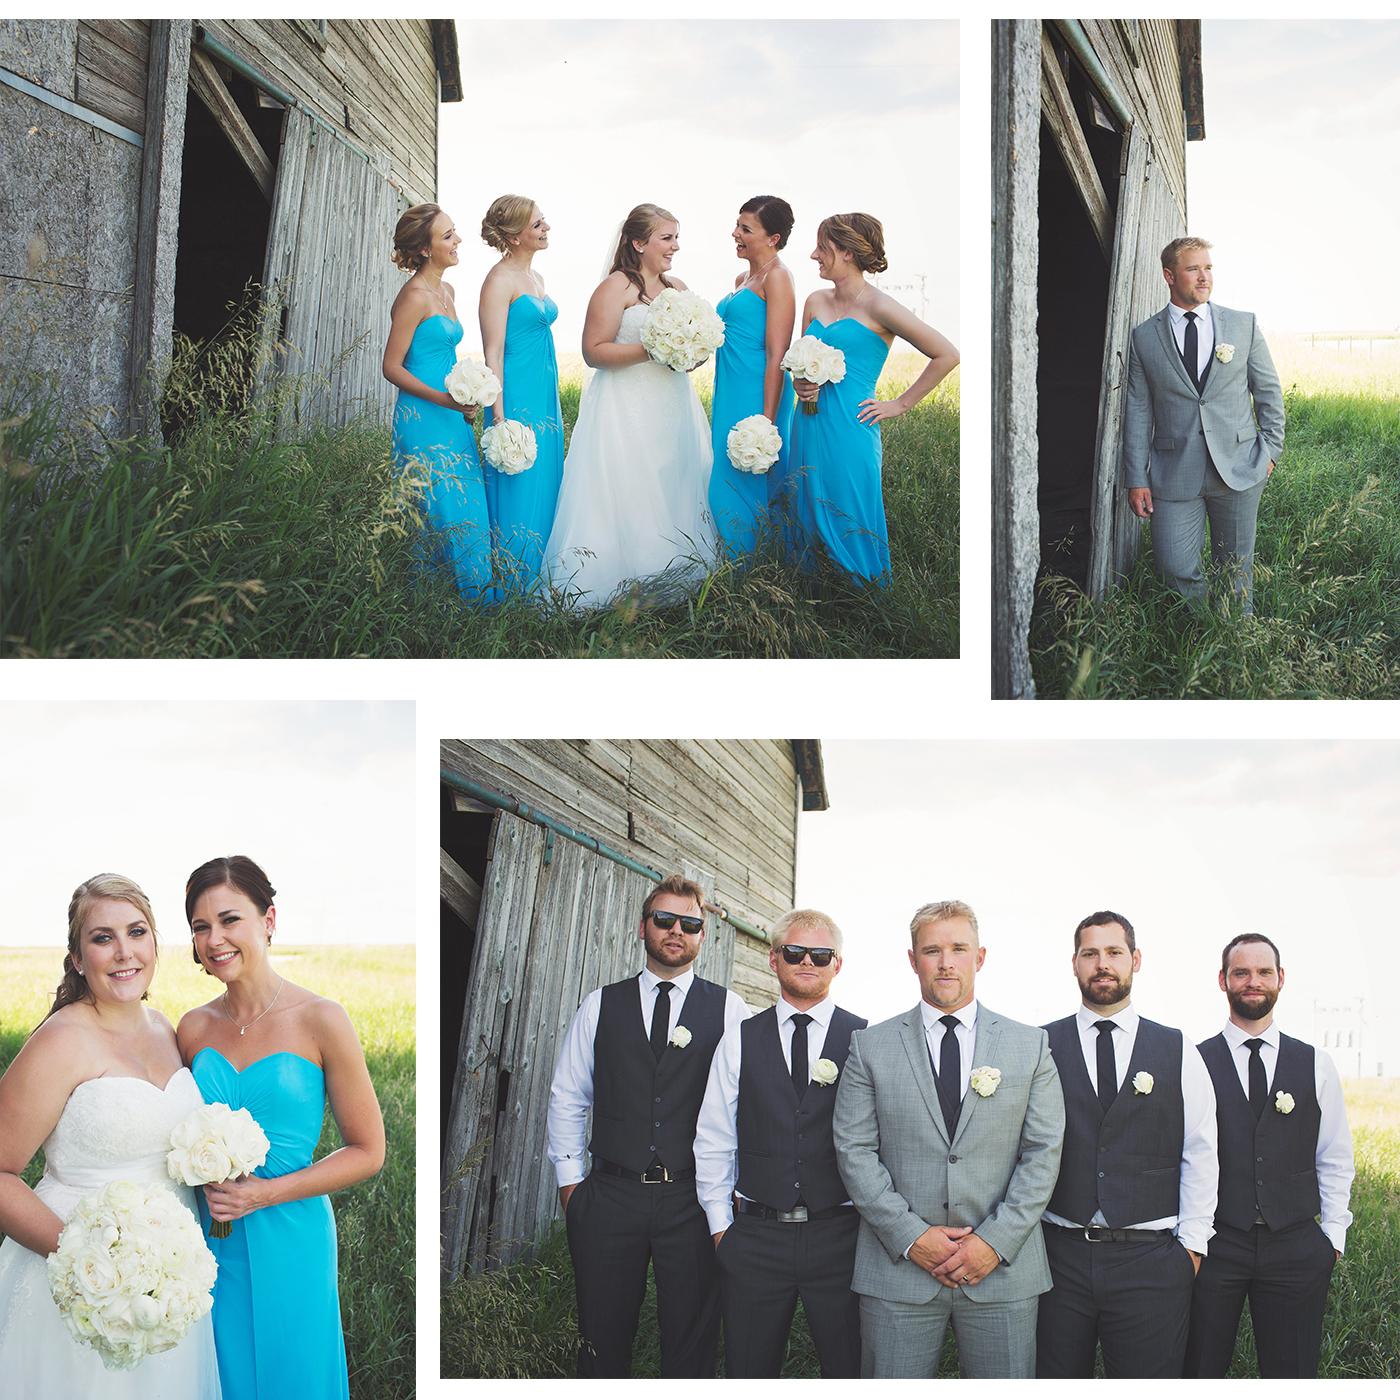 senger wedding collage 1.jpg